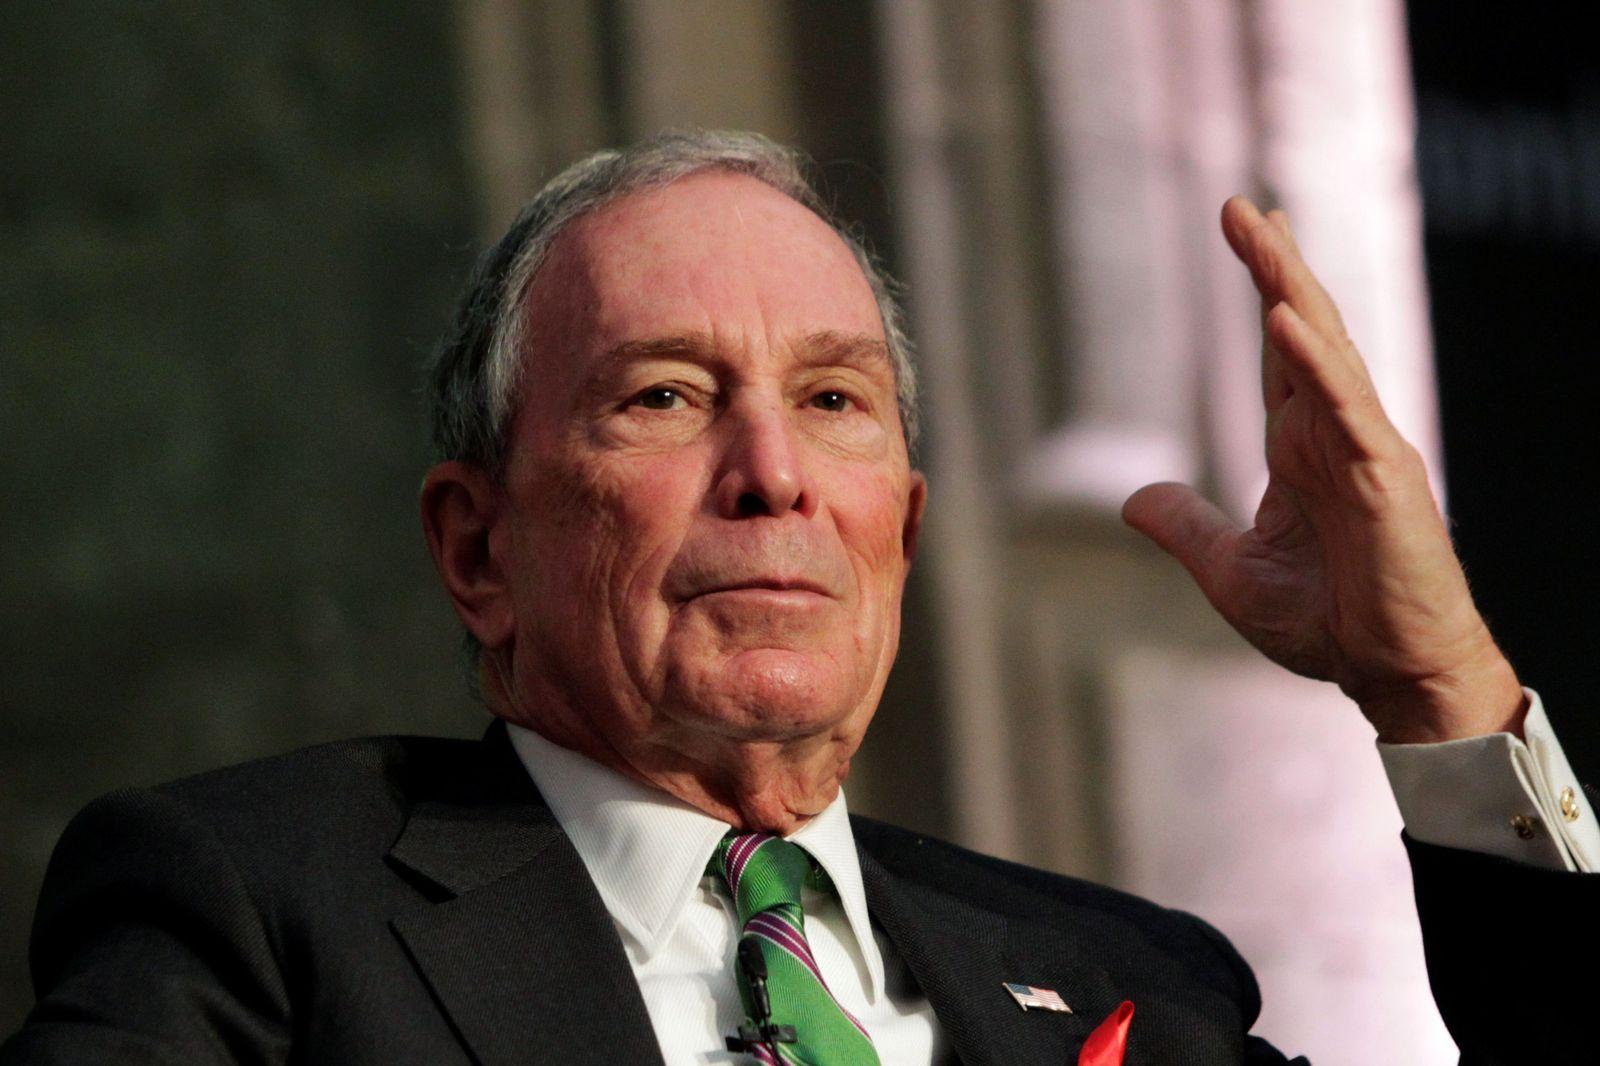 Michael Bloomberg / Milliardäre